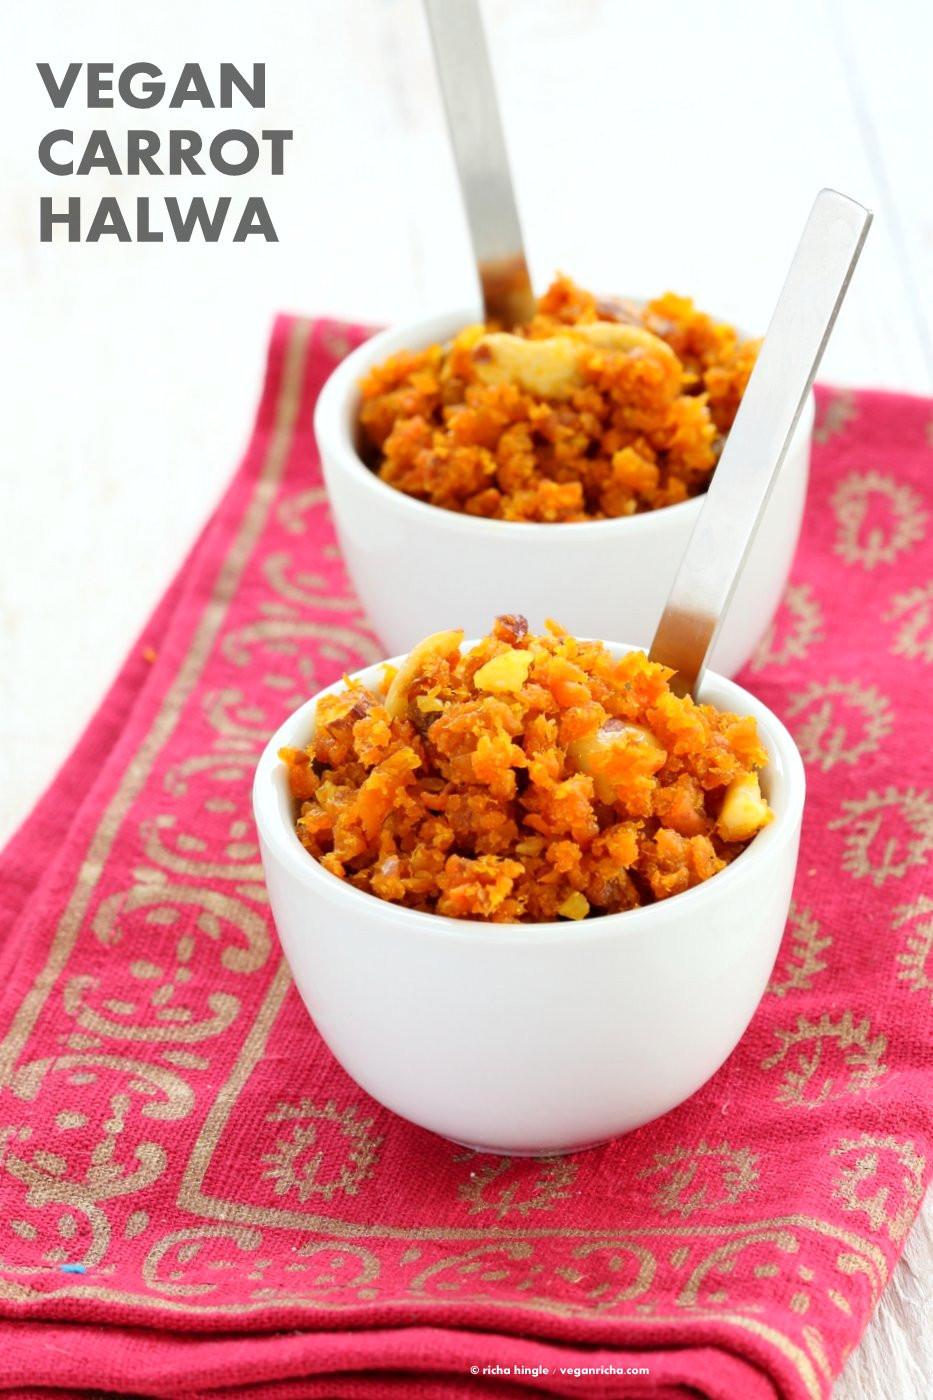 Carrot Recipes Vegetarian  Vegan Carrot Halwa Gajar Halwa Recipe Vegan Richa